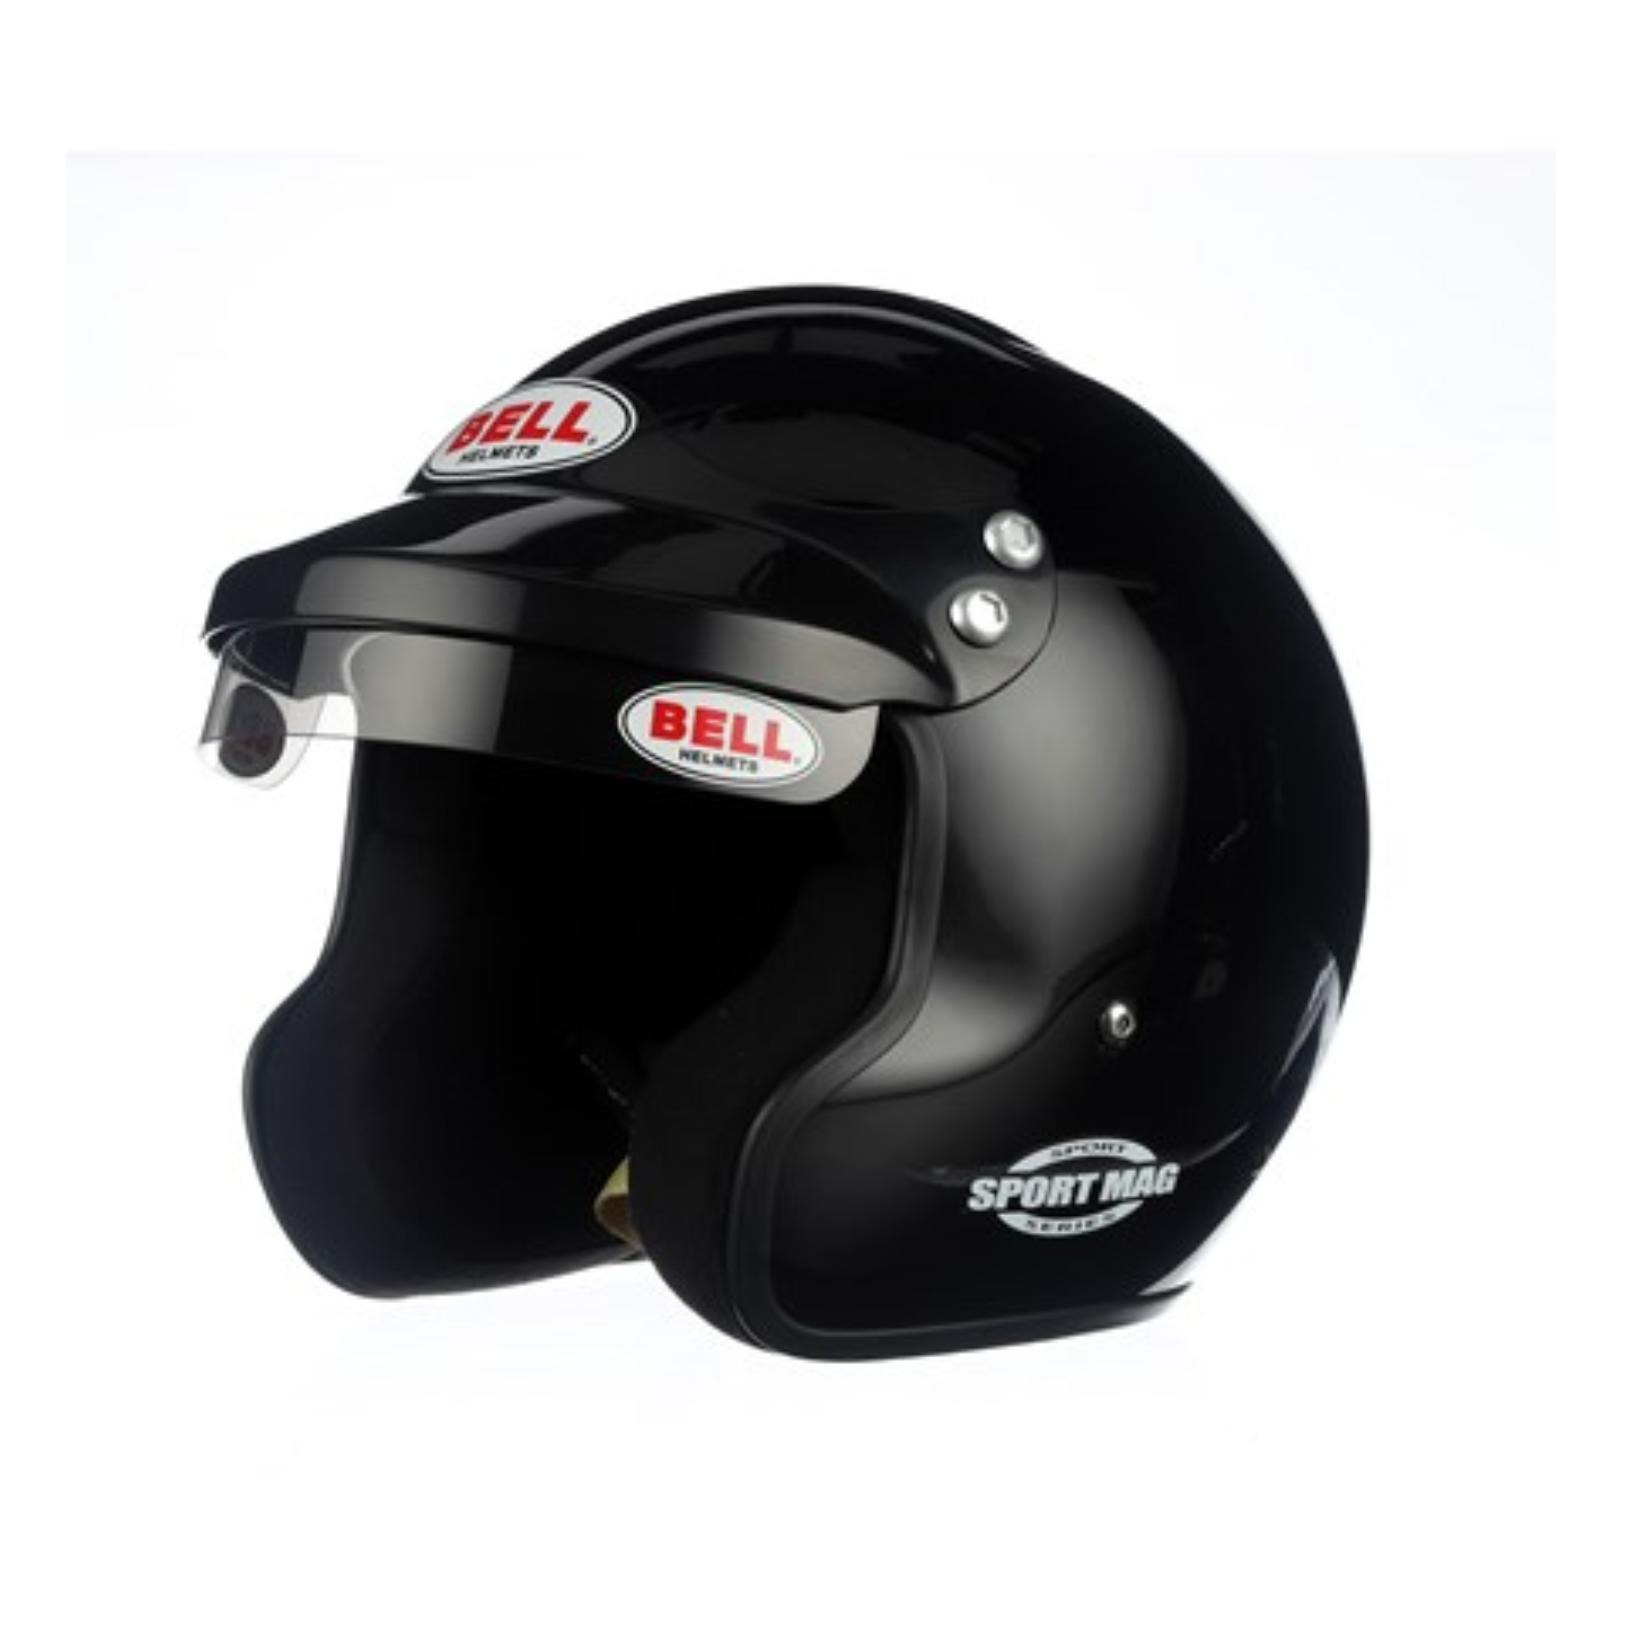 Bell Racing Helmets >> Track First Bell Helmets Bell Sport Mag Auto Racing Helmet